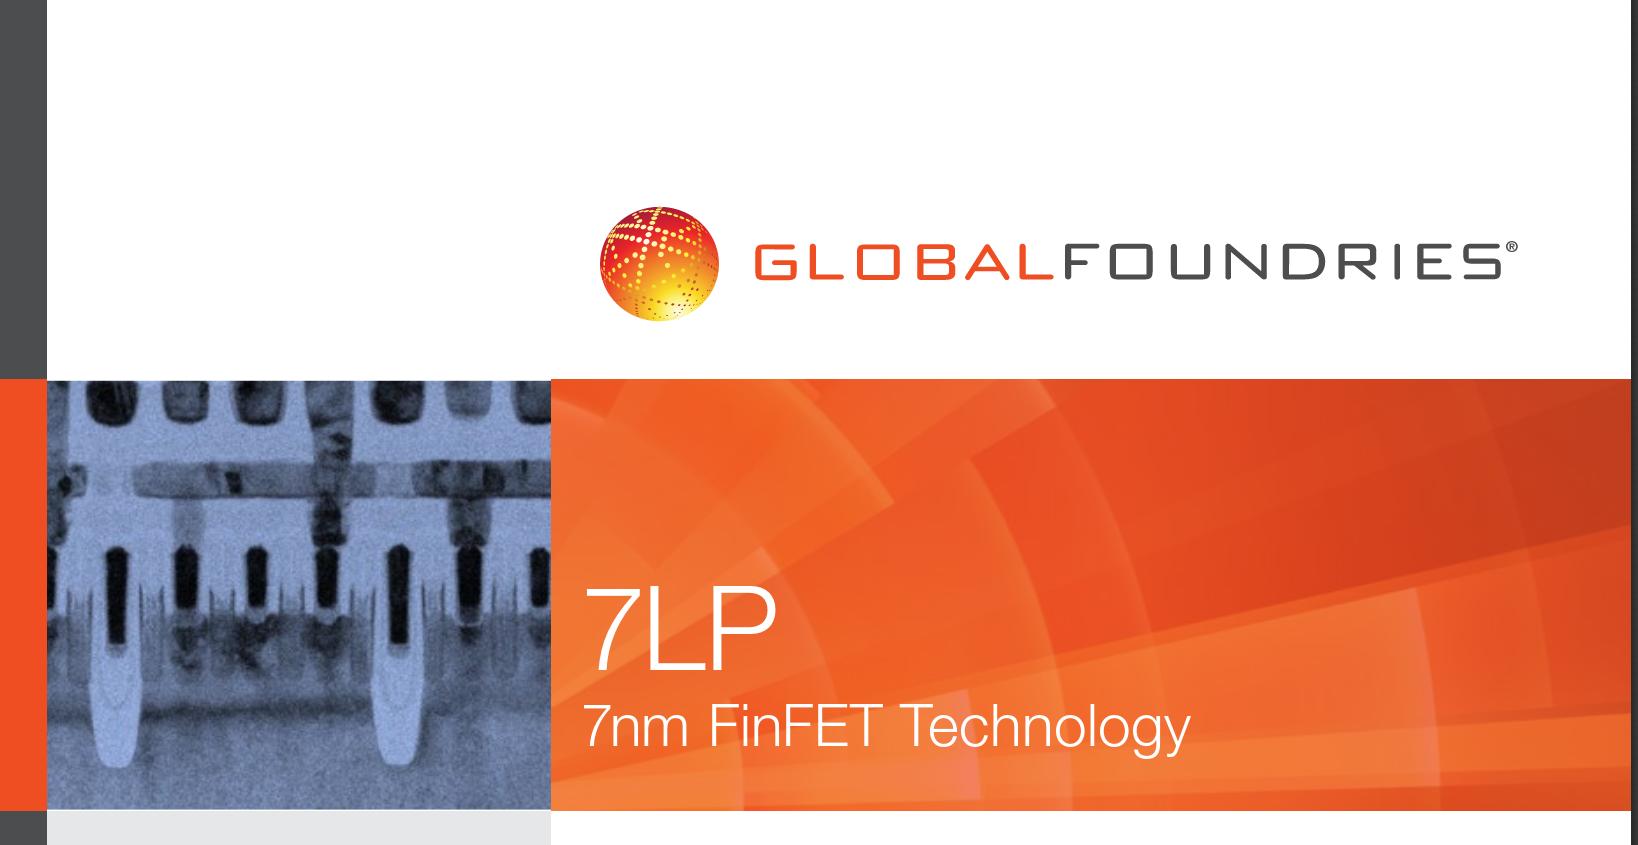 GlobalFoundries upravila plány se 7nm procesem | Diit cz